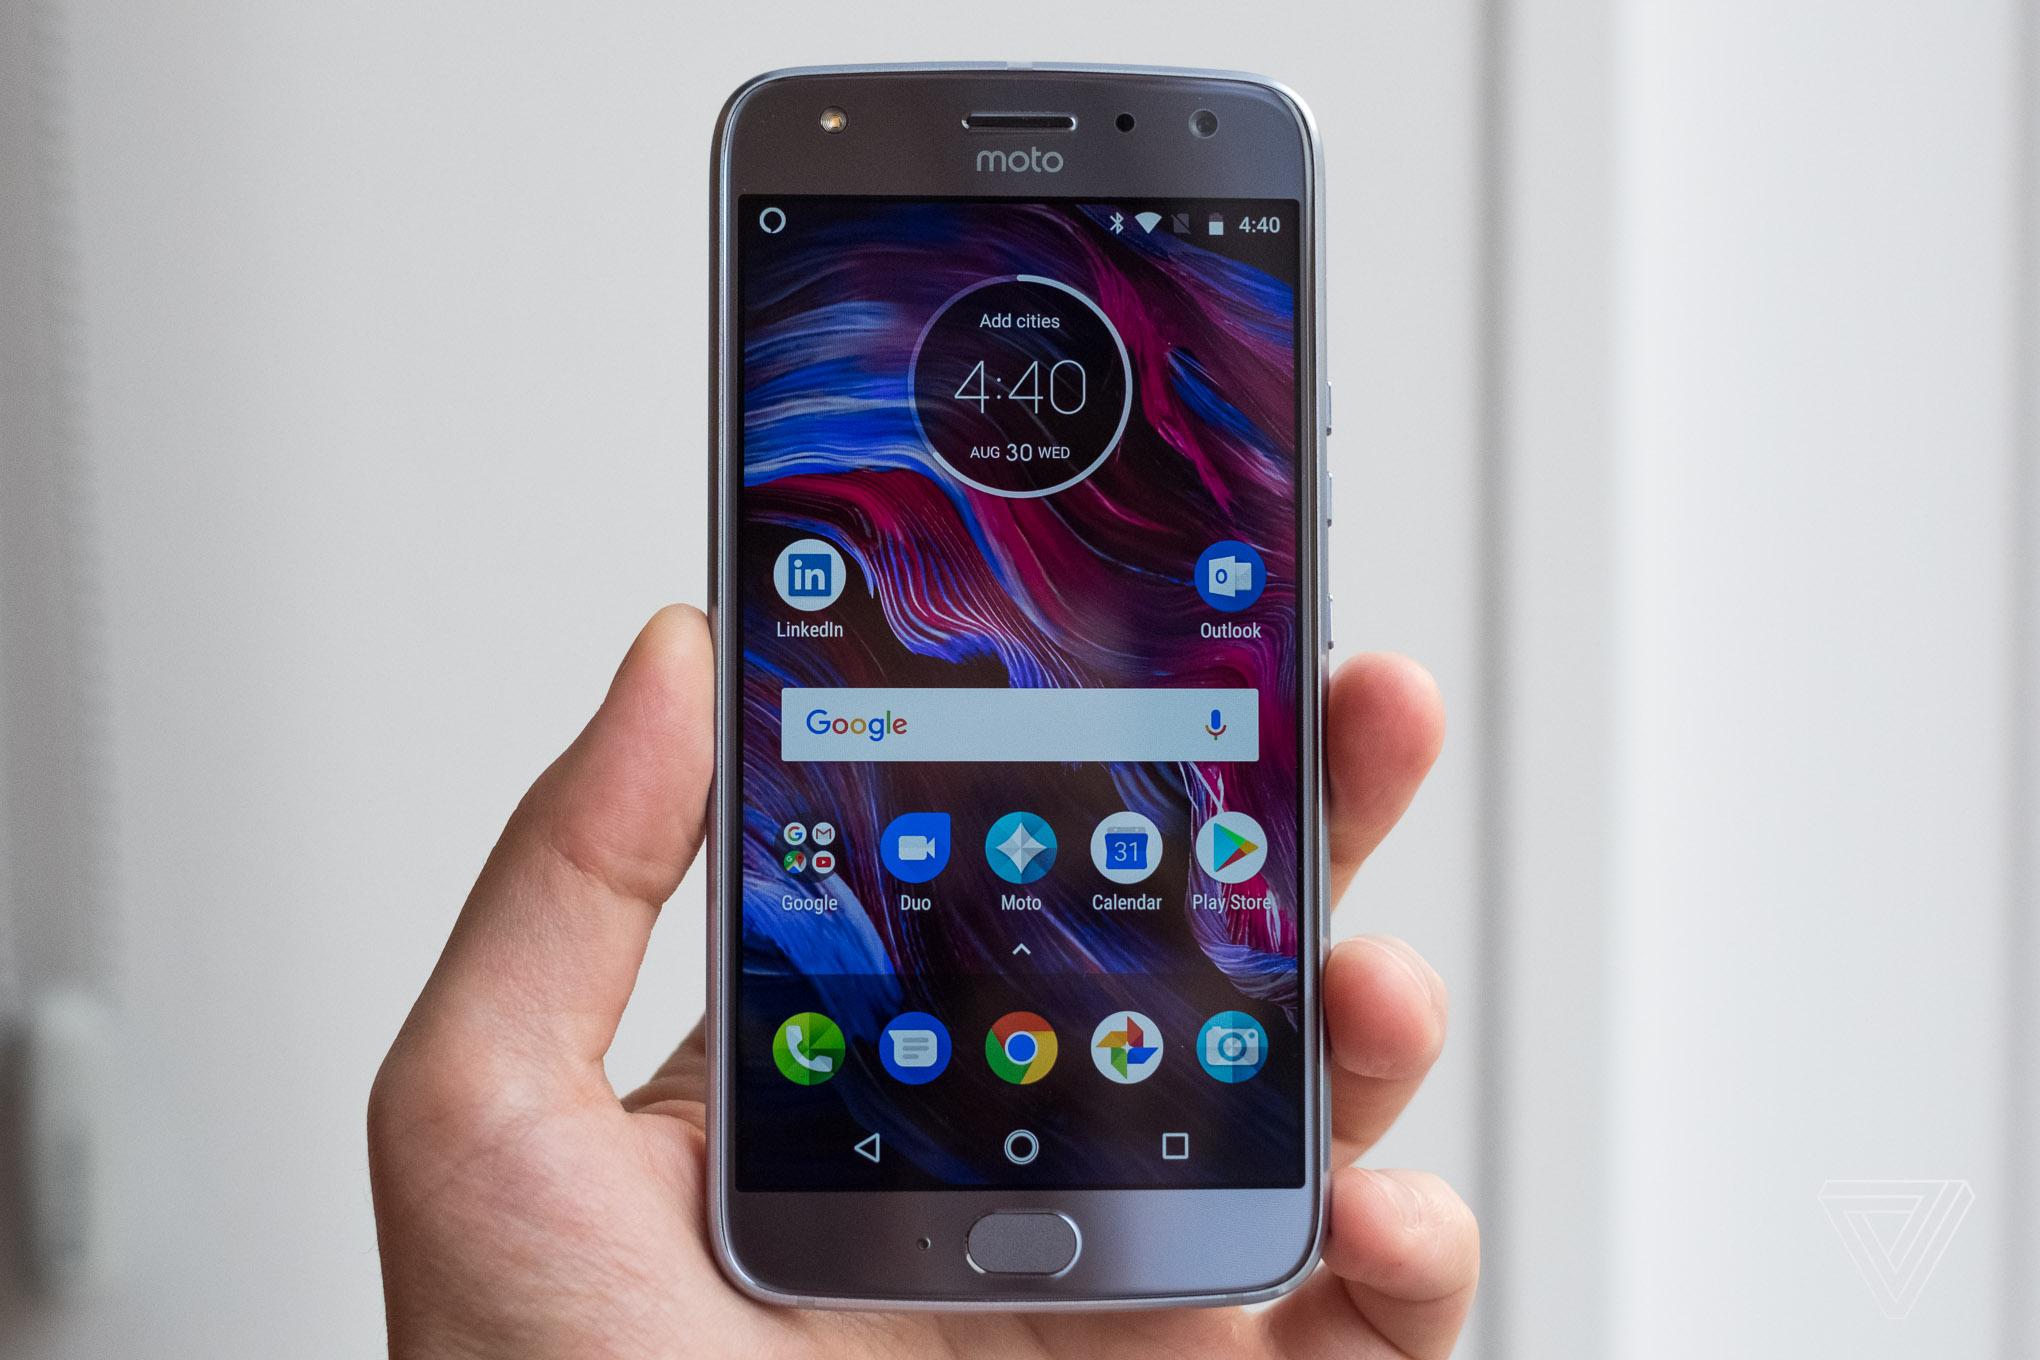 Motorola S Moto X4 Has Two Cameras And Amazon S Alexa